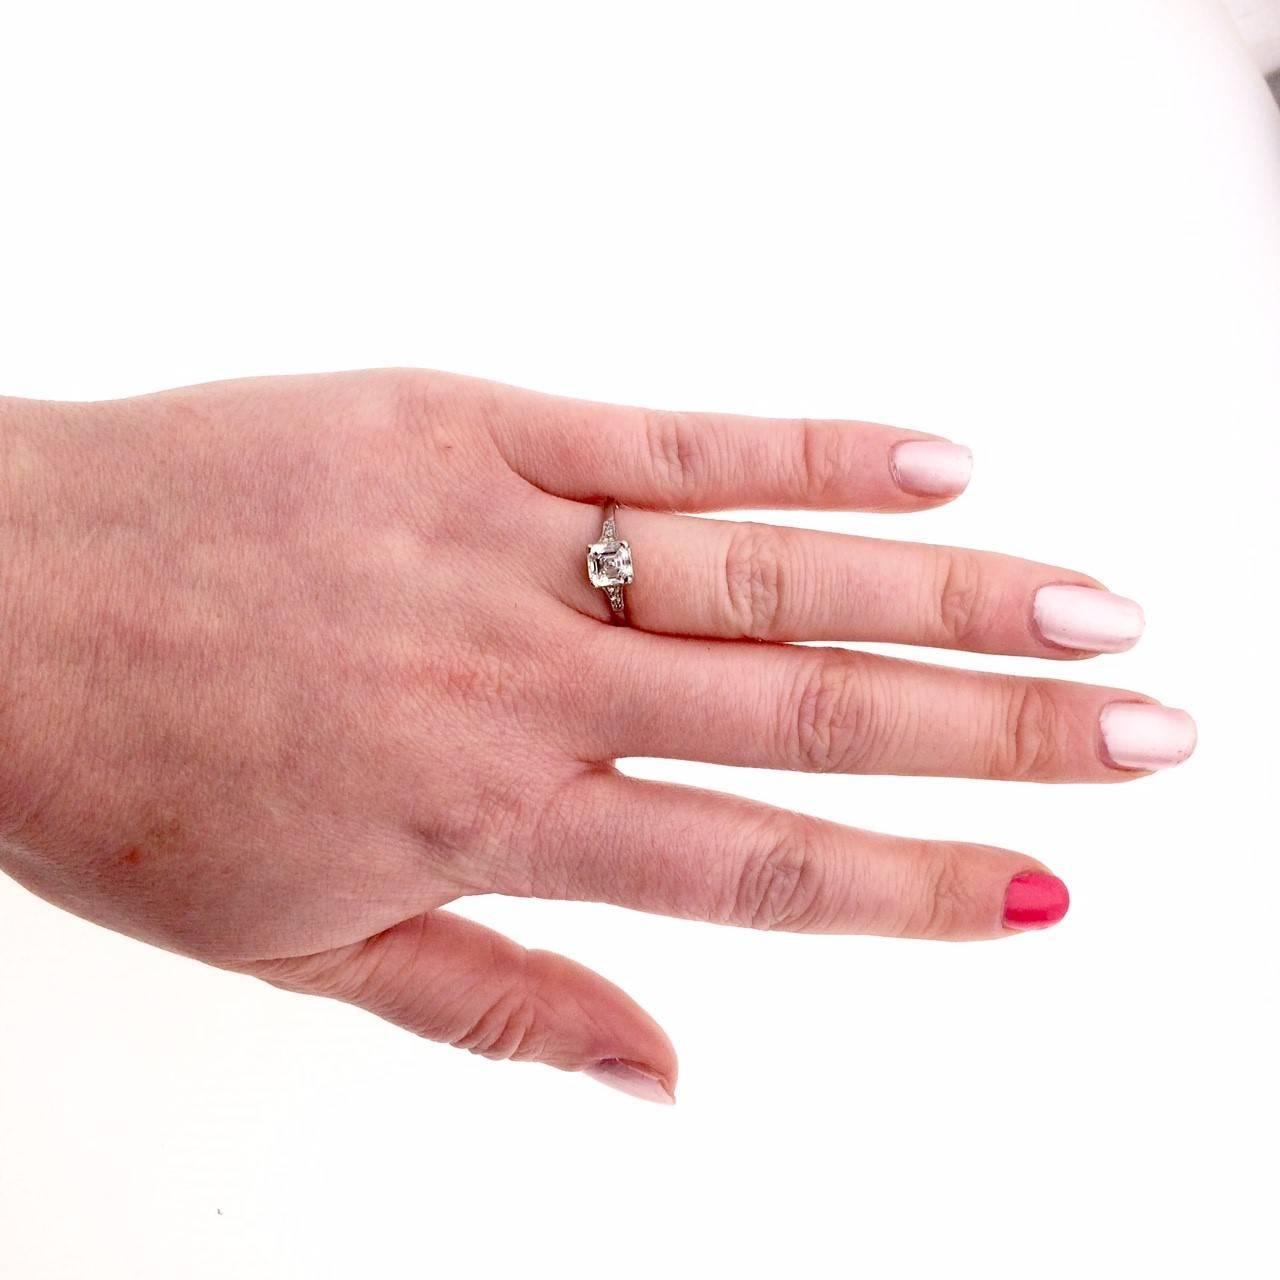 1920s Art Deco Asscher Cut Diamond Ring in Platinum For Sale at 1stdibs